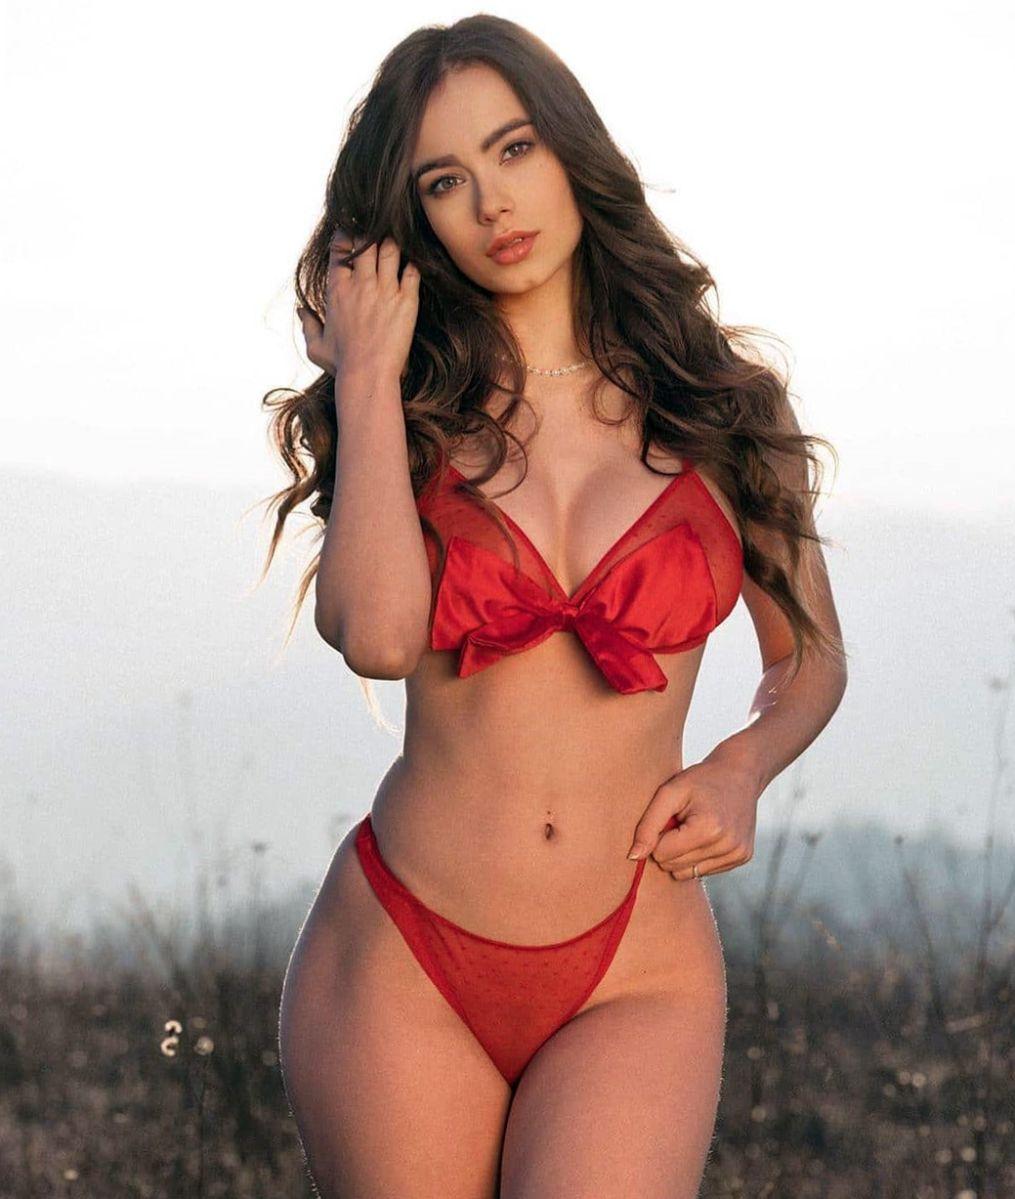 Eastern european women sexy The shocking